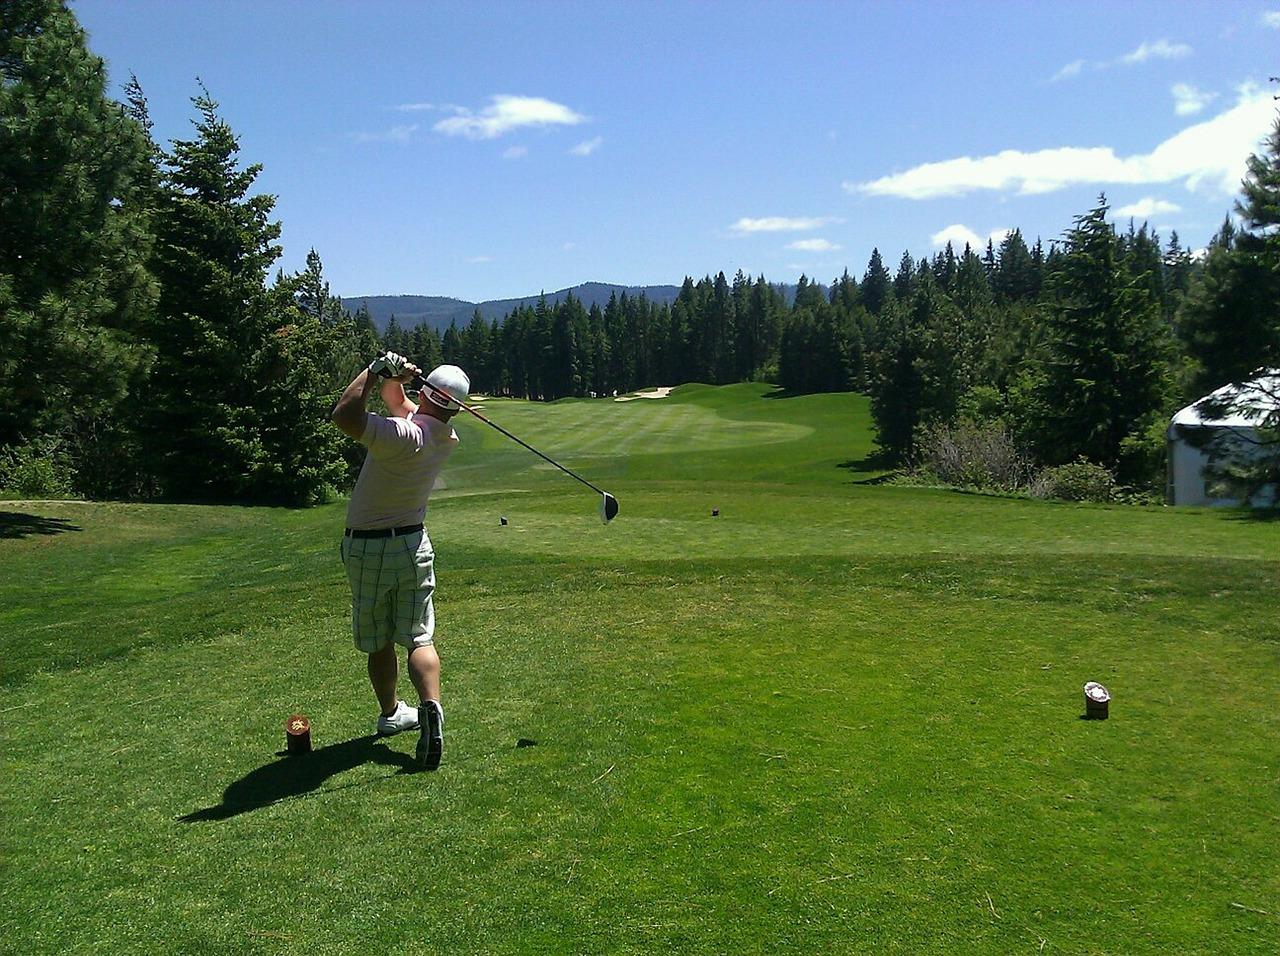 golfing, golfer, man